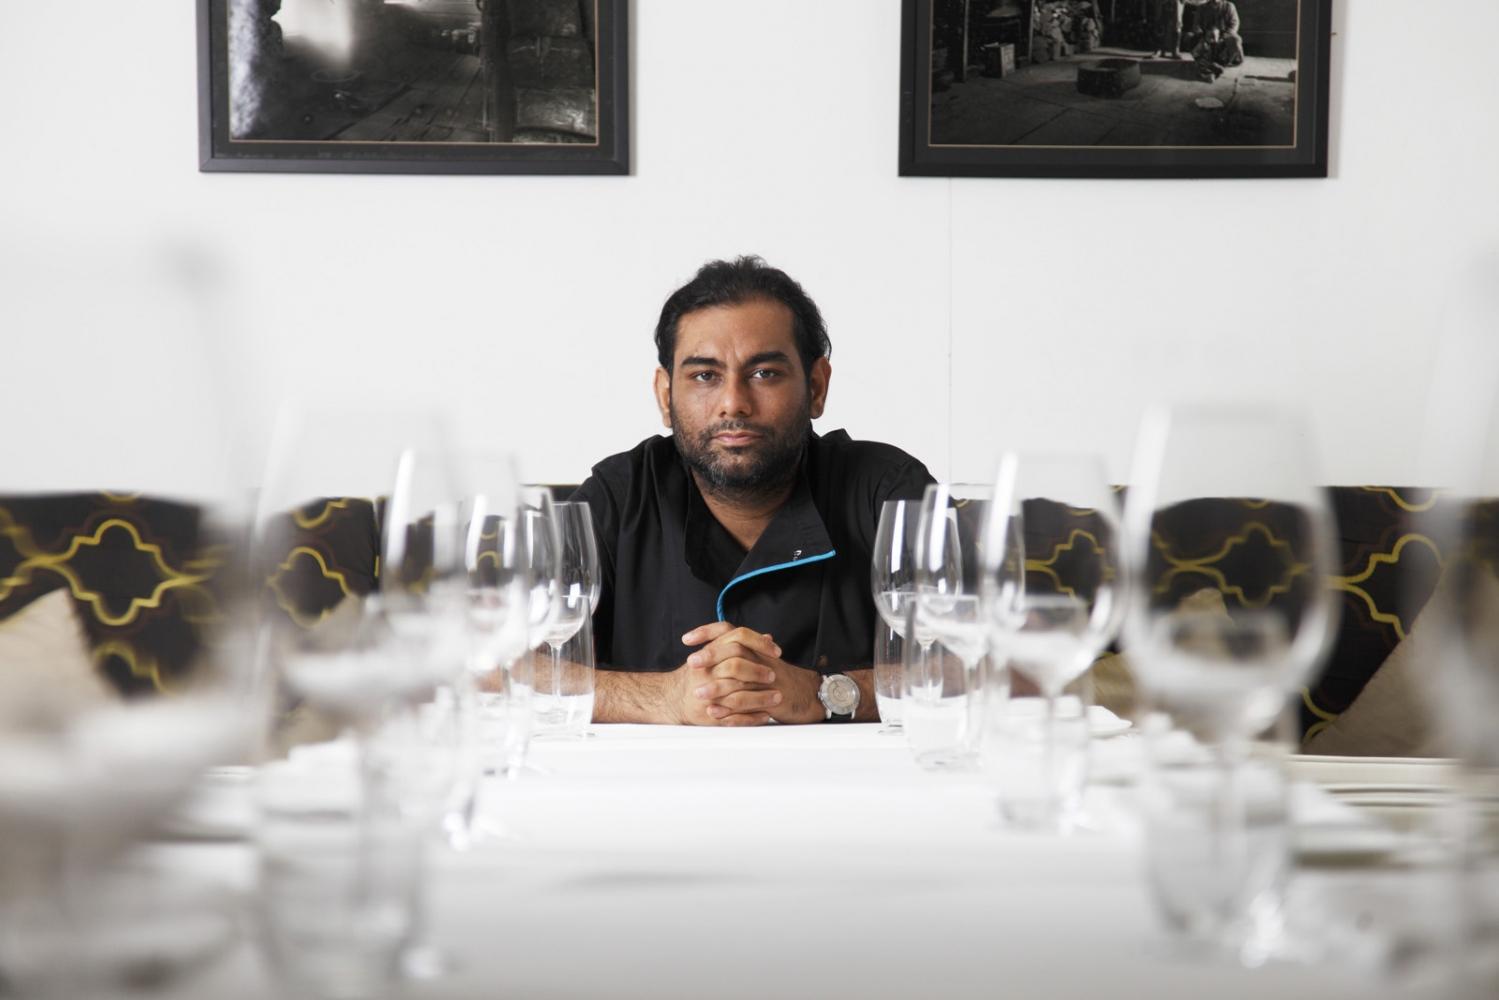 Multi award-winning chef Gaggan Anand, originally from Calcutta, in his restaurant Gaggan which specialises in progressive Indian cuisine.  Bangkok, Thailand